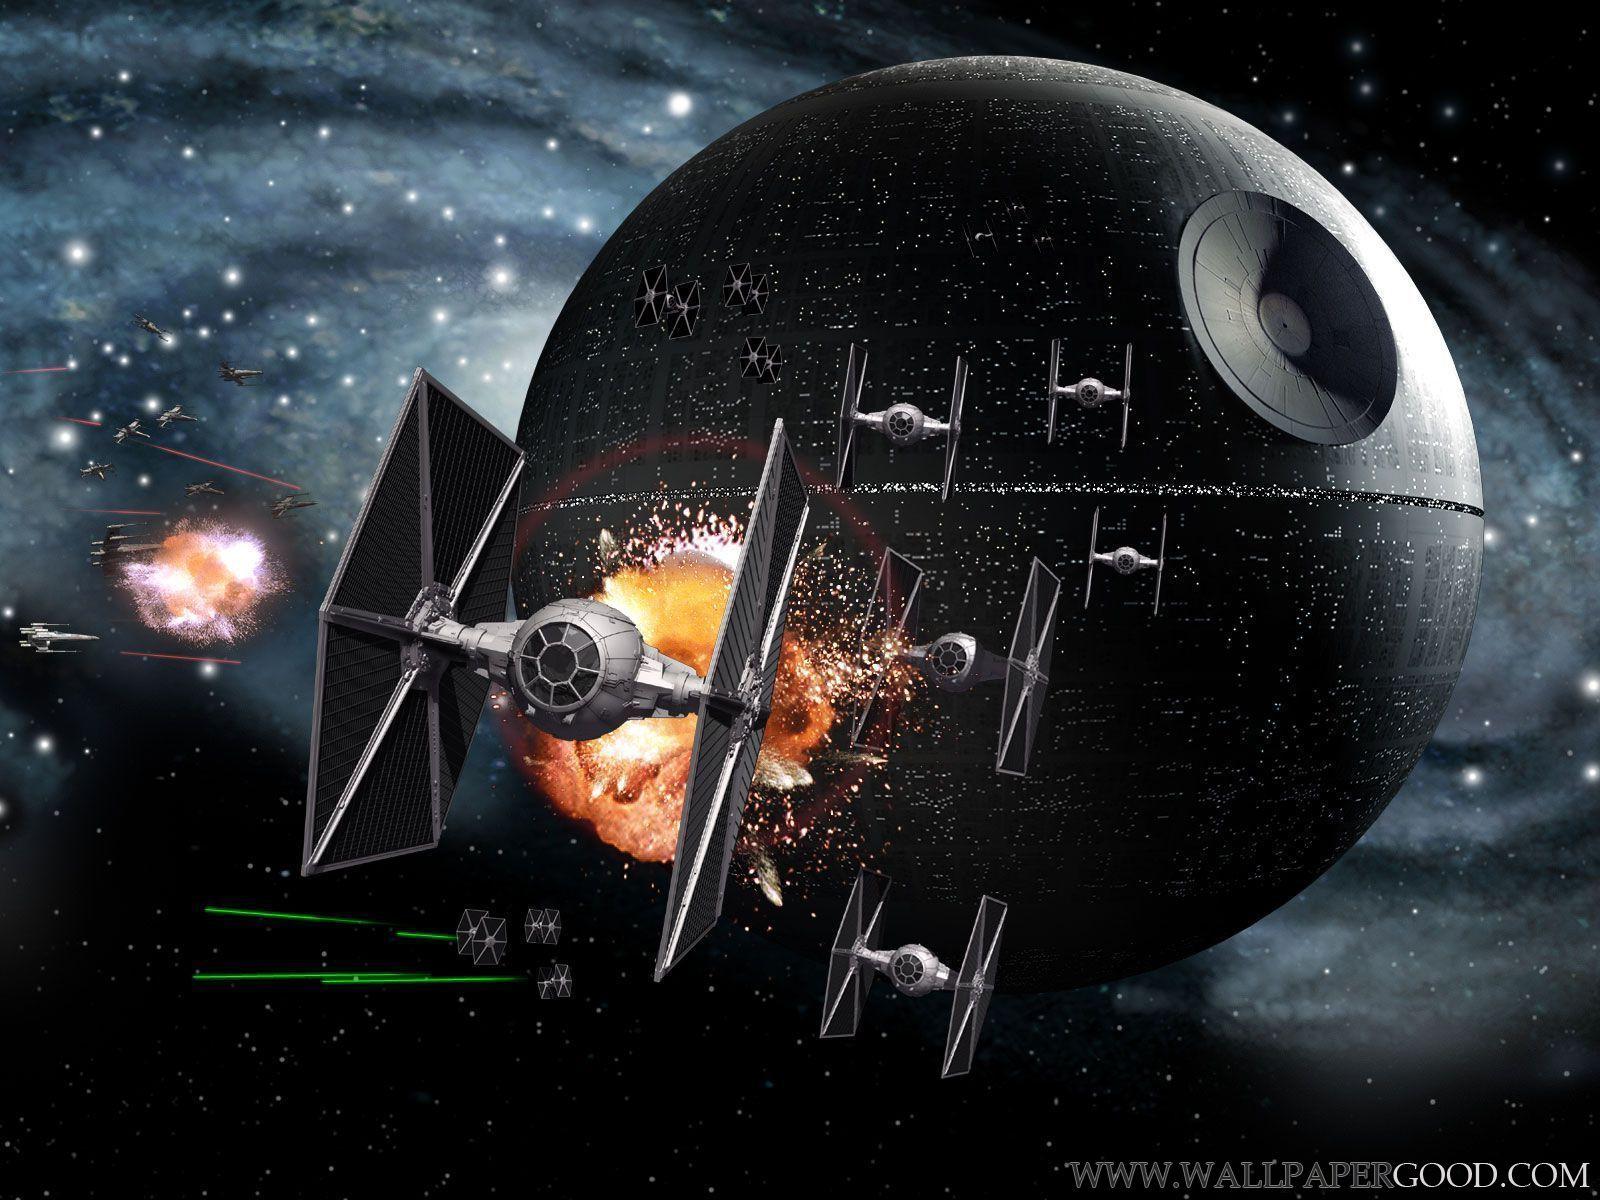 Star Wars 4k Wallpaper Mobile Phone Hd